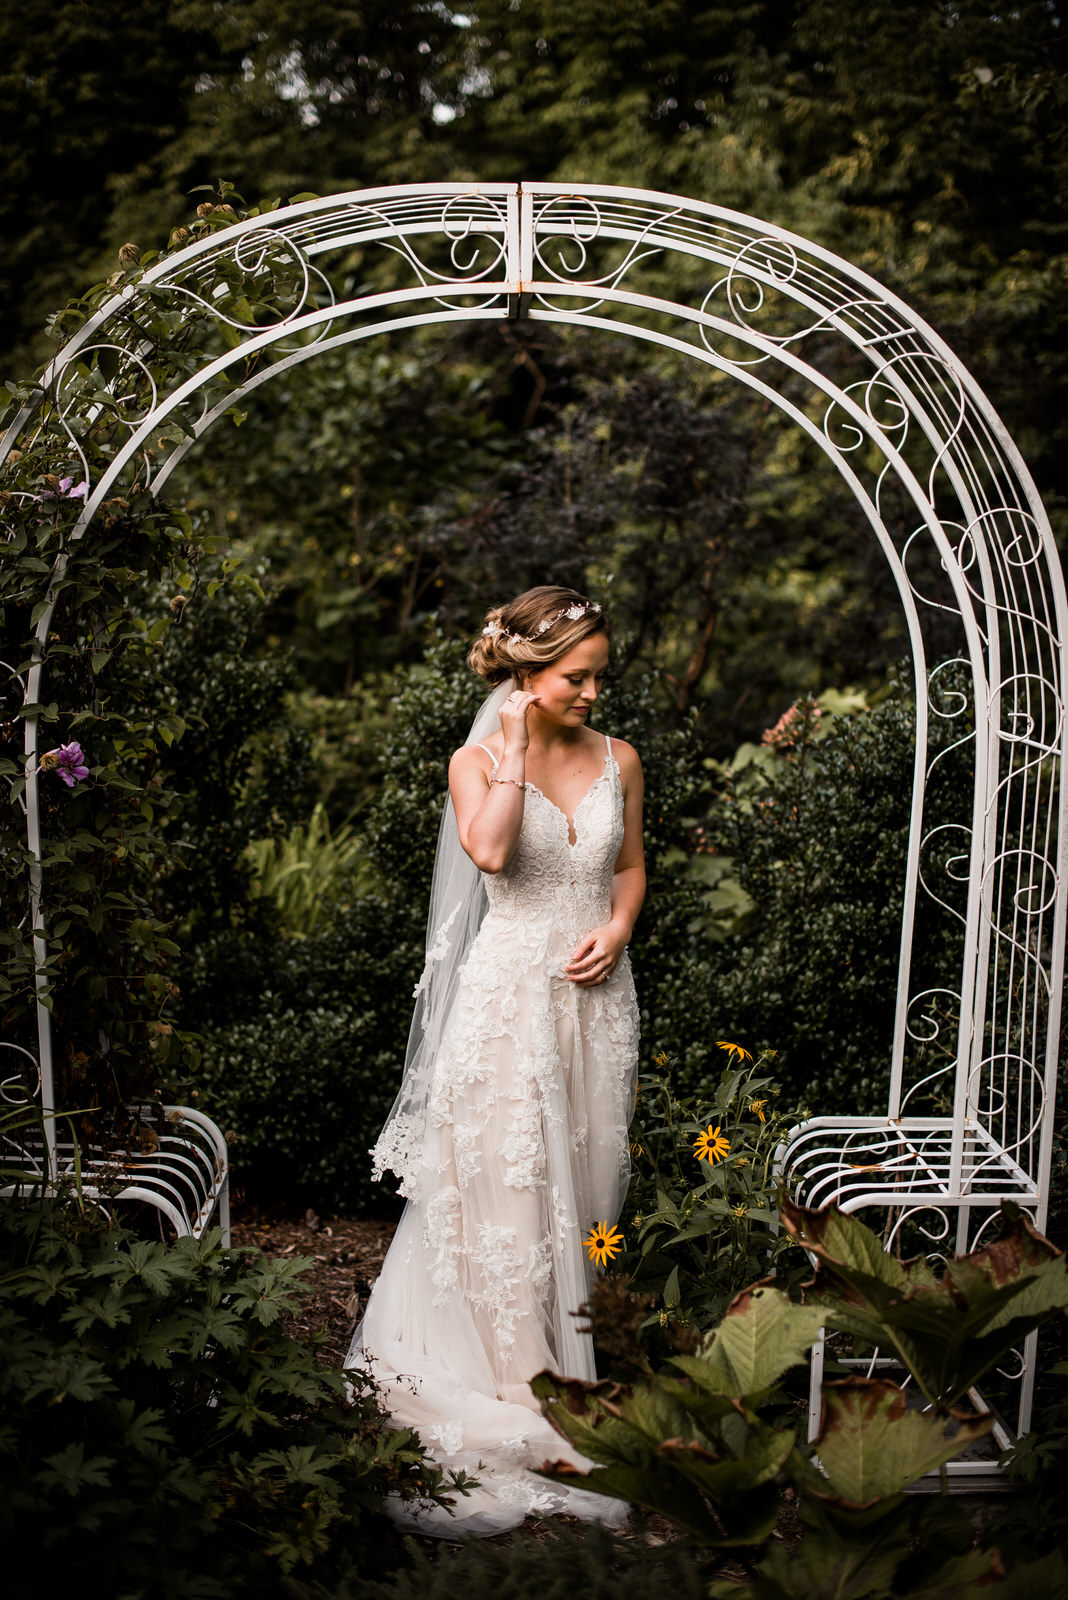 Inn-At-Tranquility-Farm-Bridal-Session-6.jpg